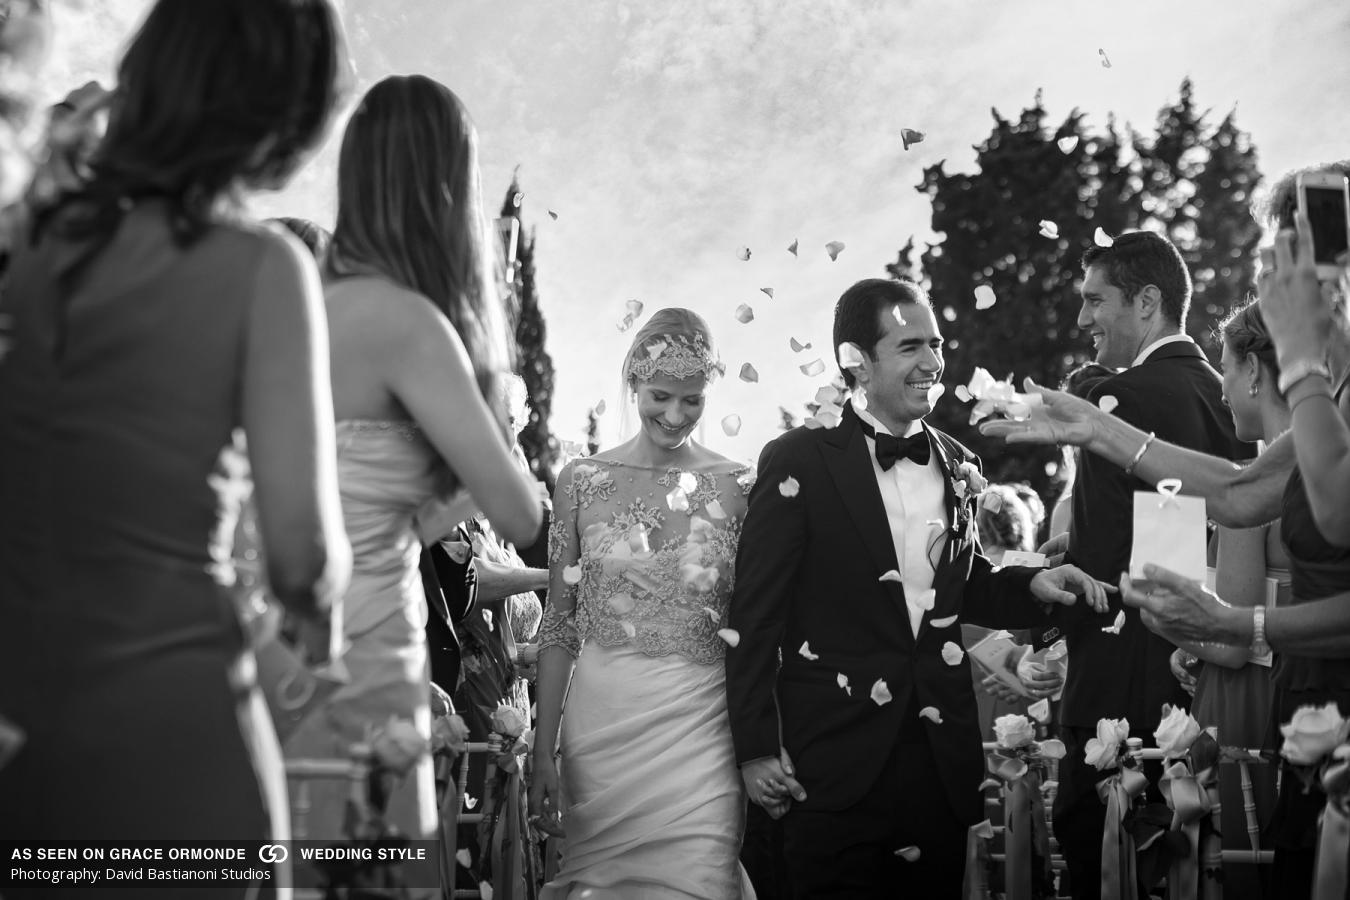 david-bastianoni-wedding-2015-07_0 :: Grace Ormonde :: Luxury wedding photography - 2 :: david-bastianoni-wedding-2015-07_0